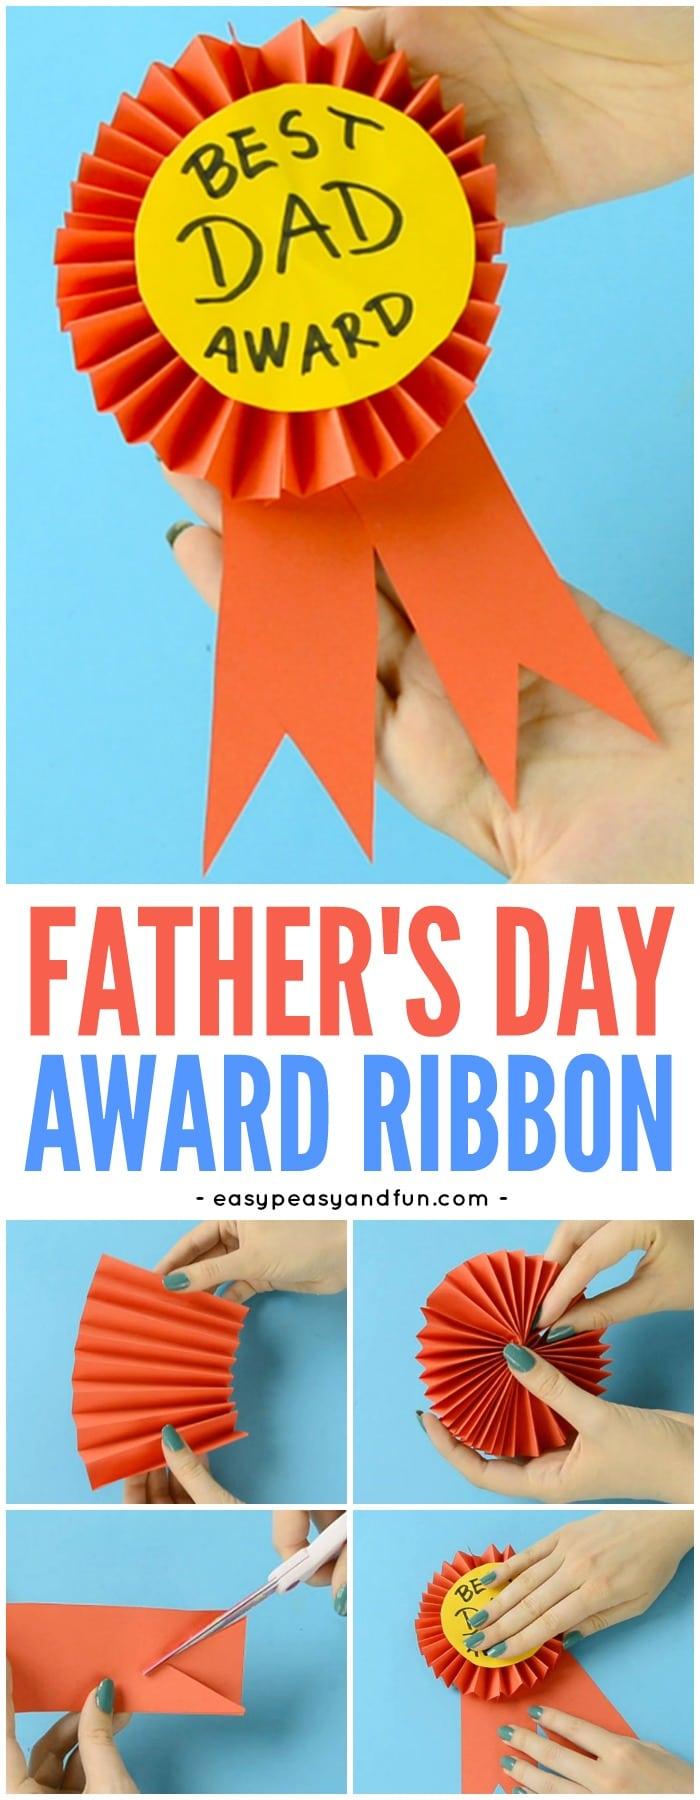 37 DIY Paper Award Ribbon